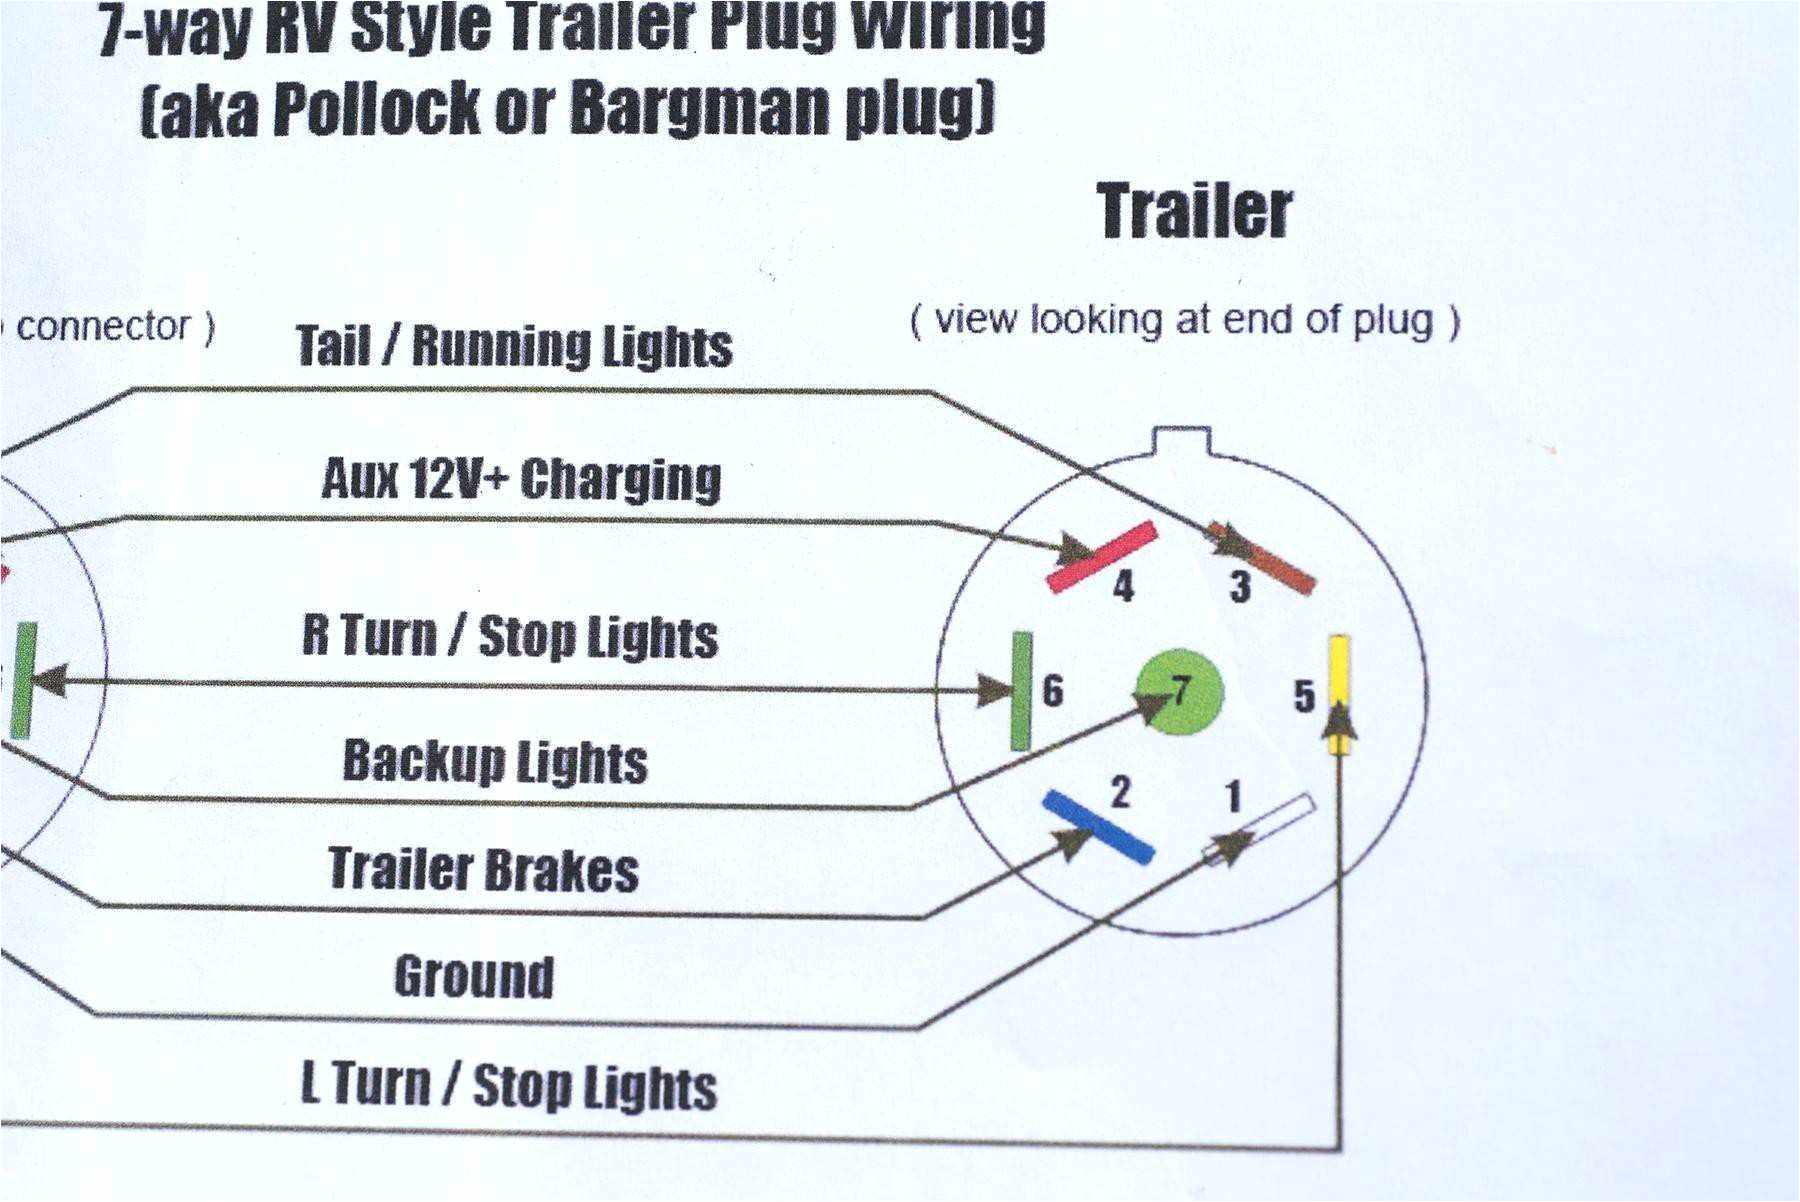 tatung connector diagram wiring diagrams bib 20059 hopkins wiring diagram